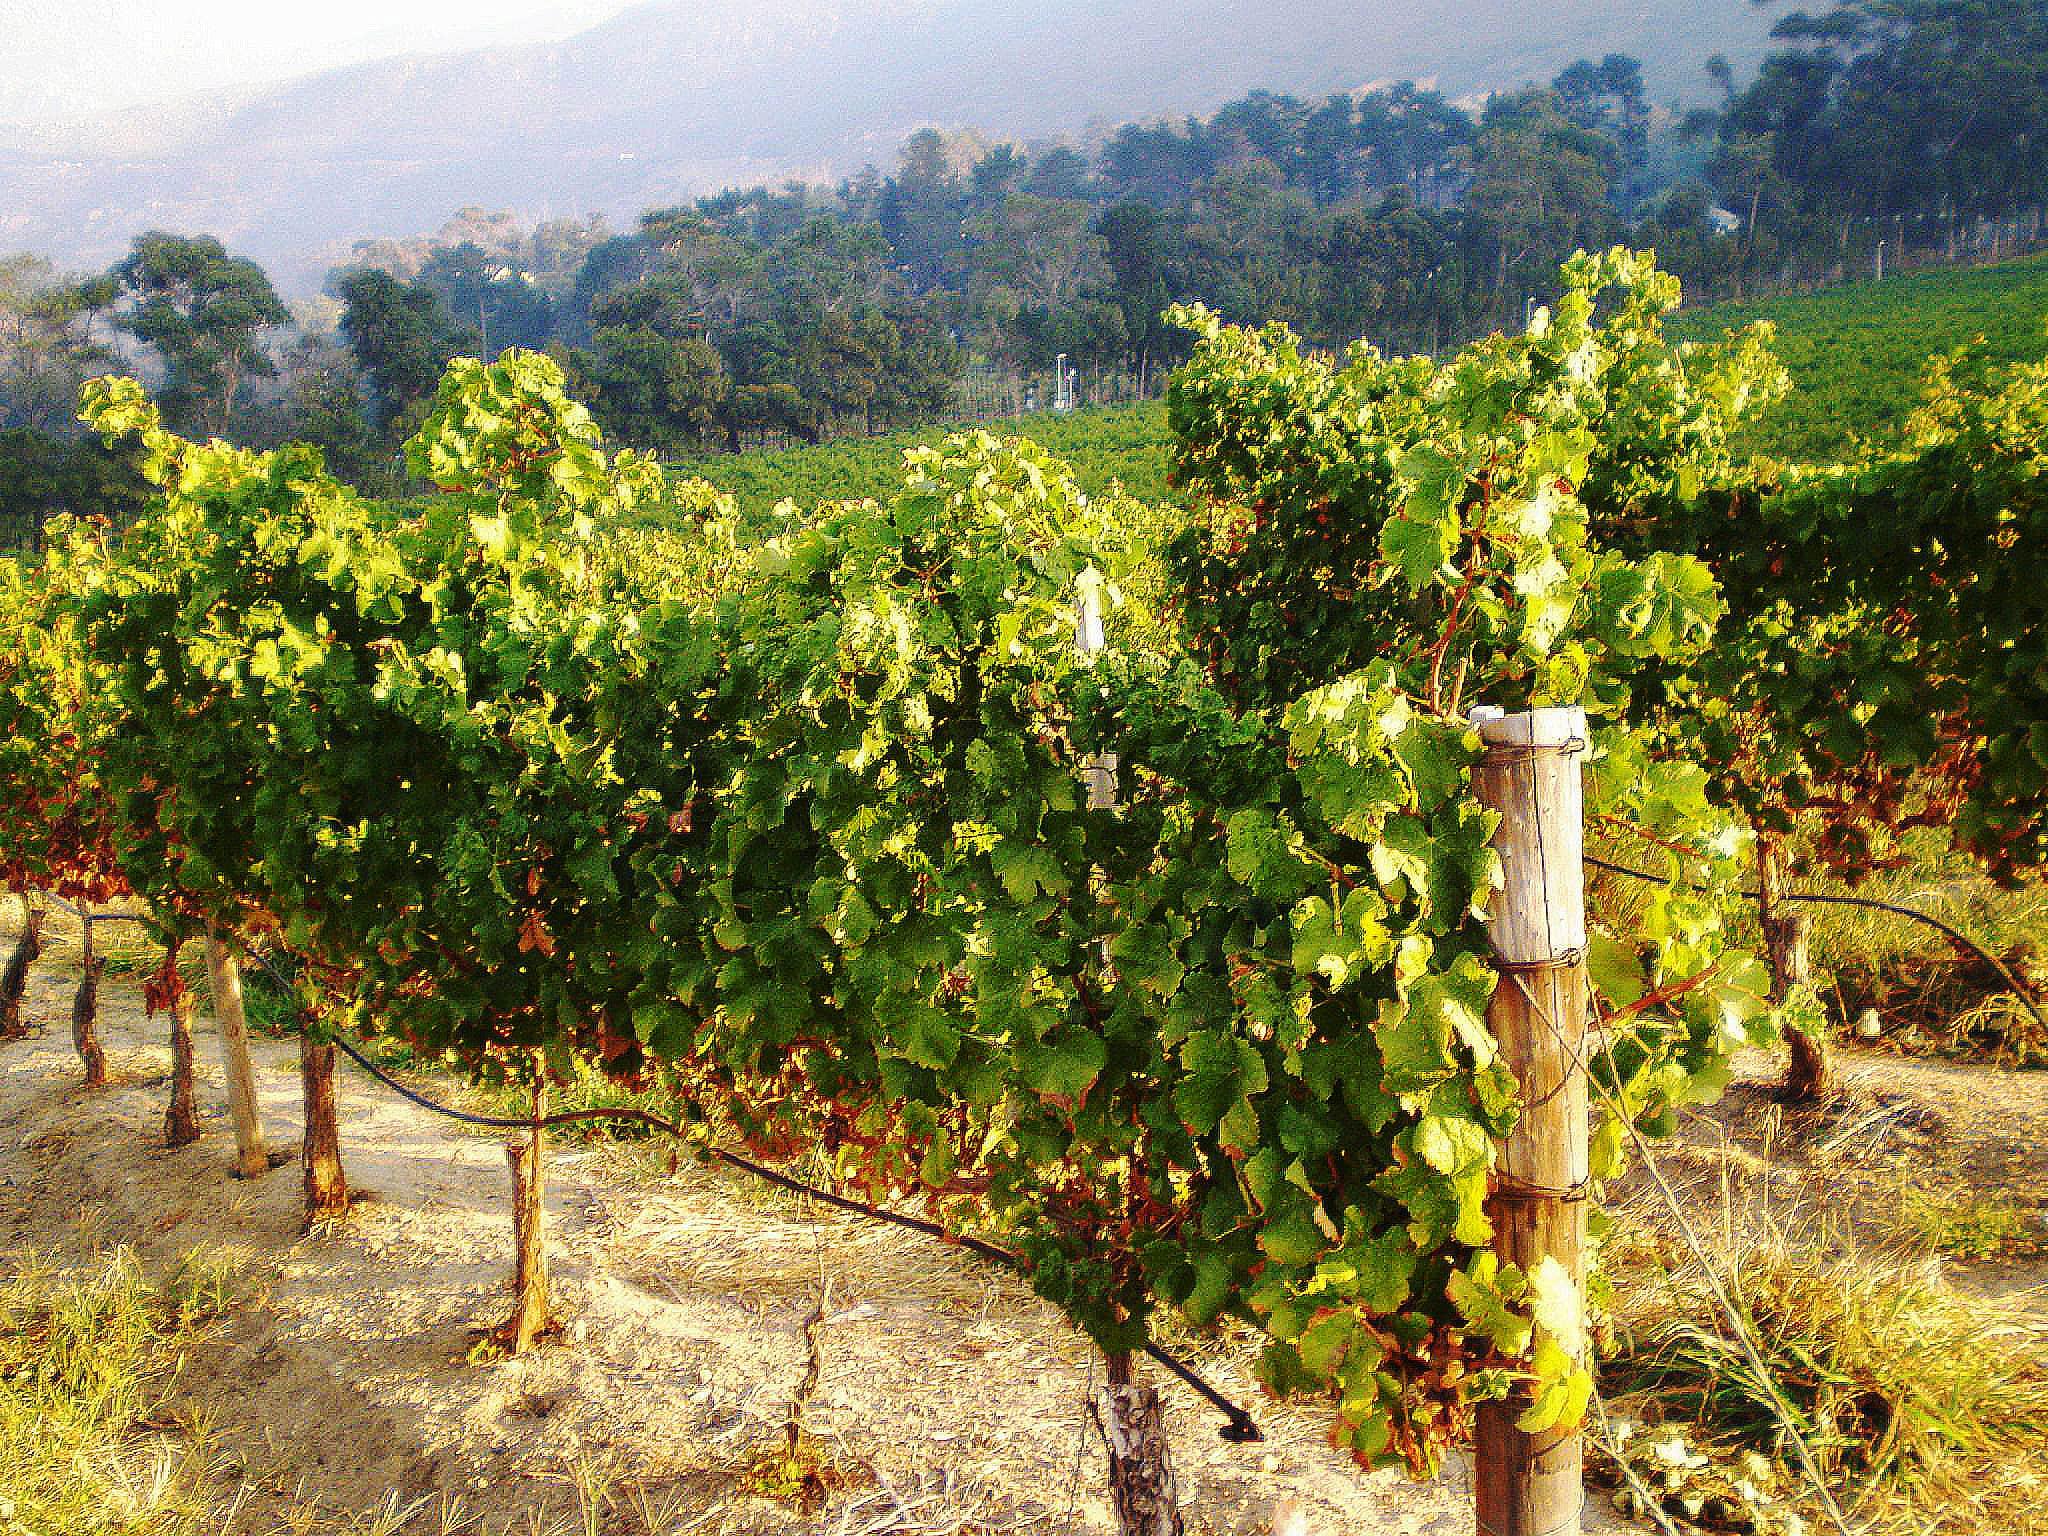 Steenberg_Wineyards_Afrique_du_Sud-min.jpeg